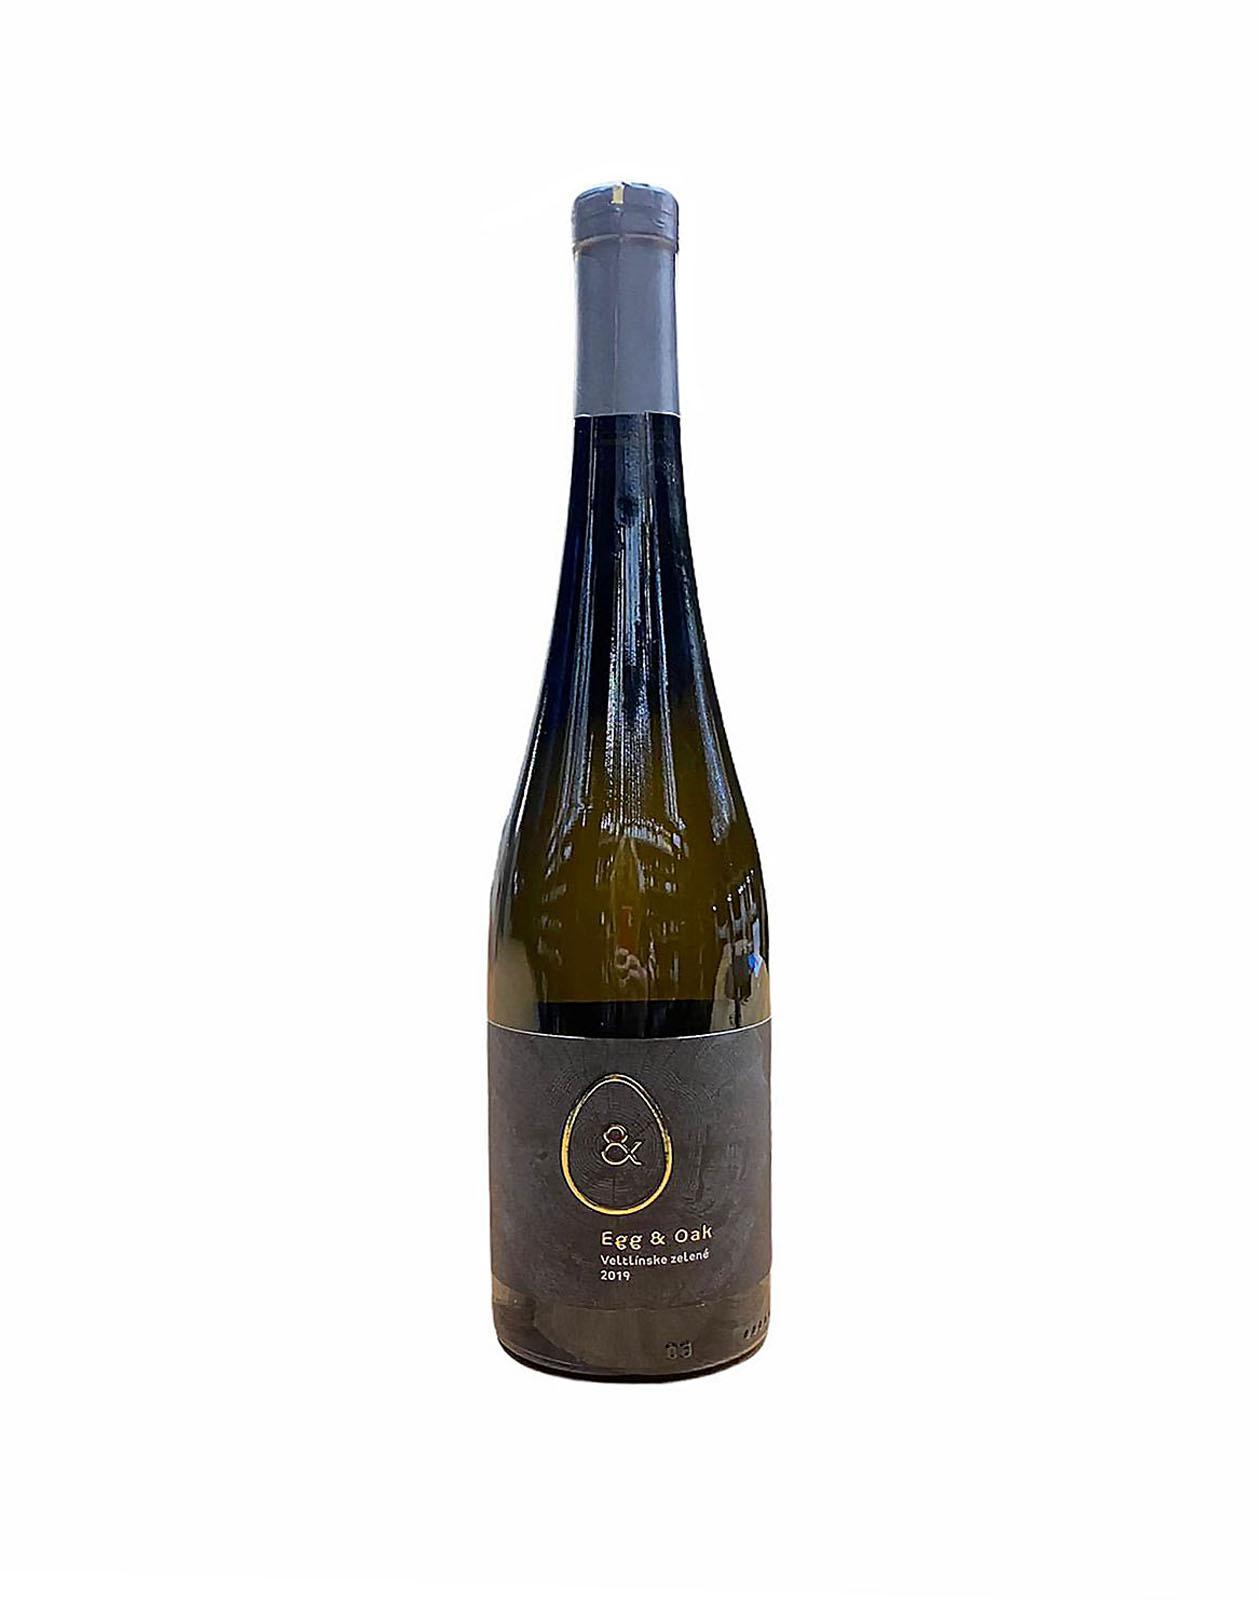 Vins Winery - Egg and Oak - Ventlínske zelené, vinotéka v Slnečniciach, Slovenské biele víno, Bratislava Petržalka, Sunny Wines, rozvoz vín, wine shop